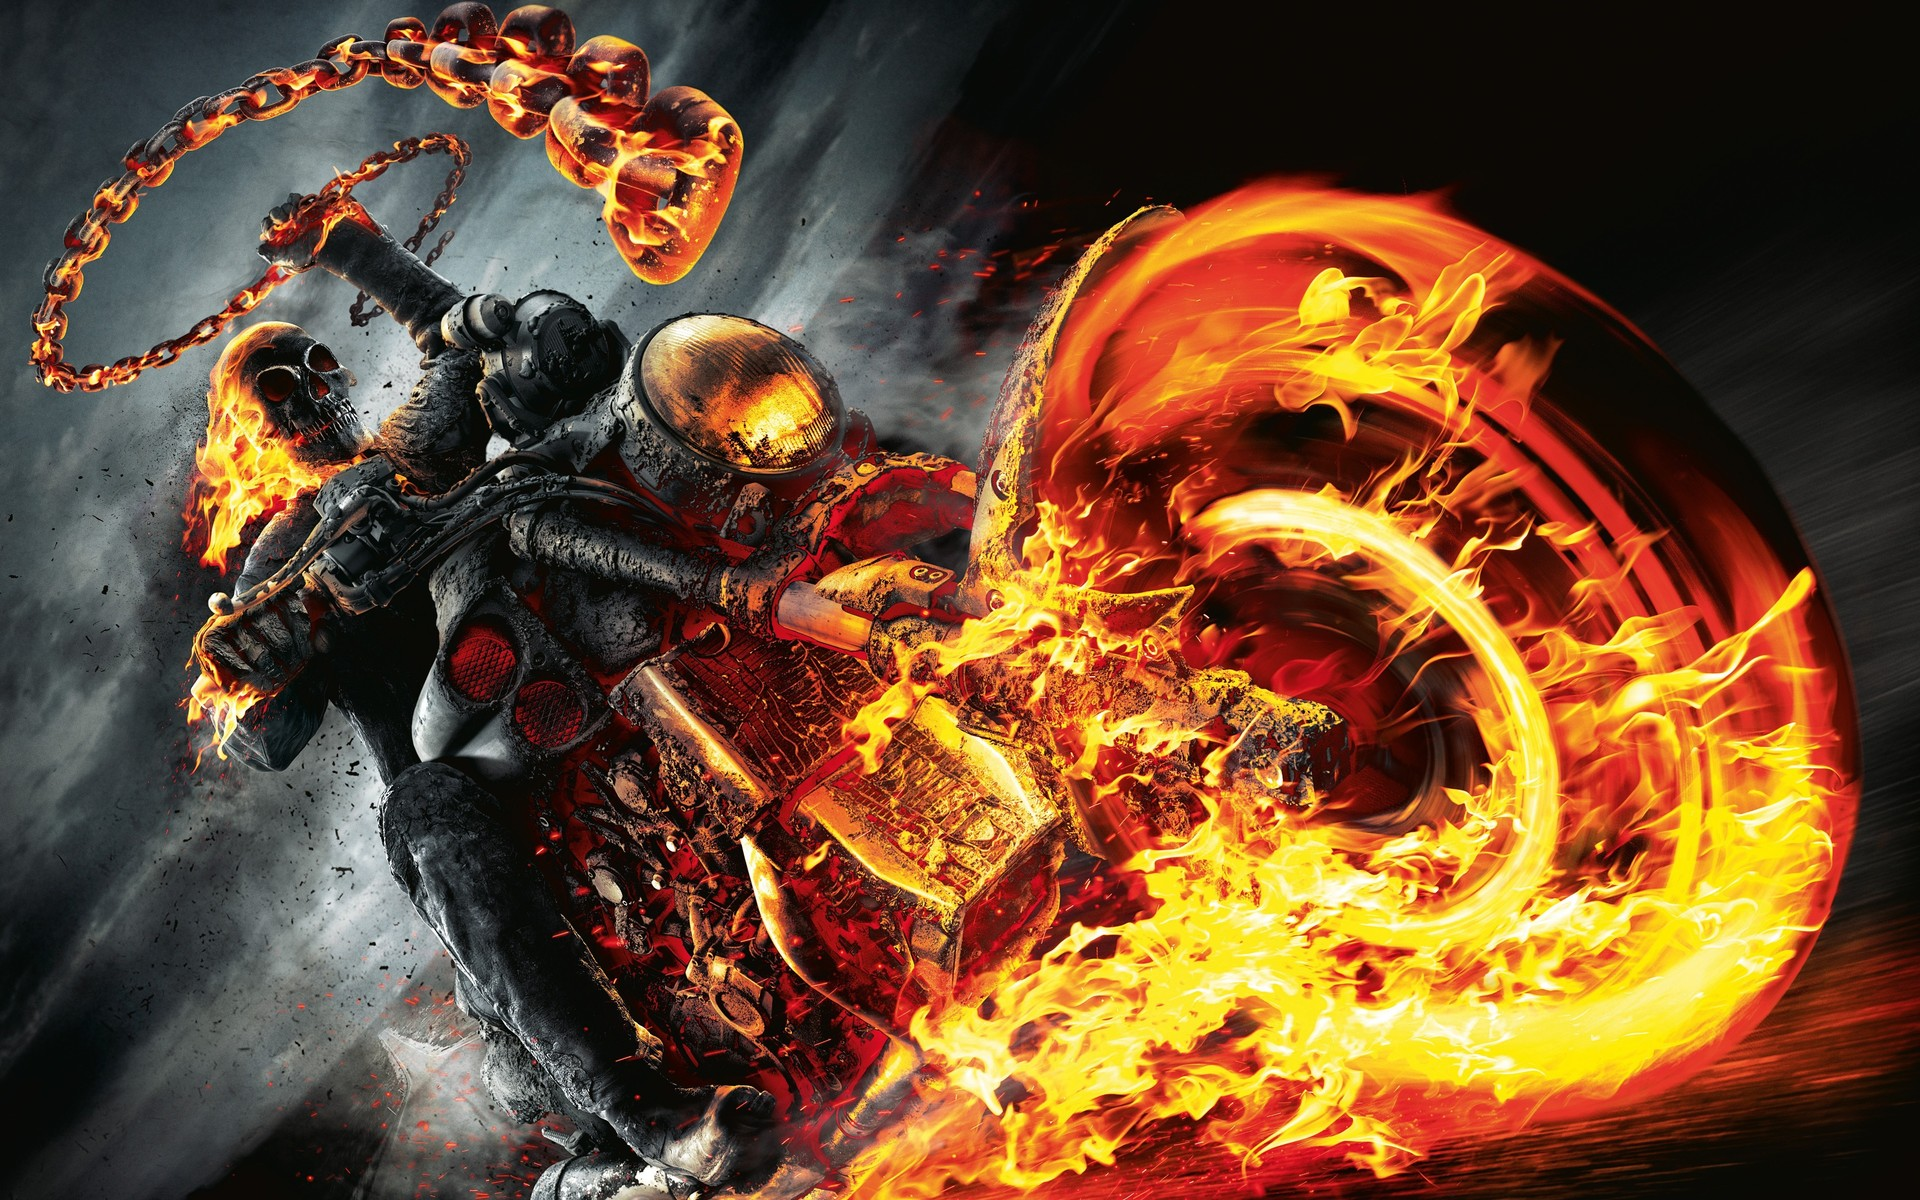 Skulls On Fire Wallpaper - WallpaperSafari